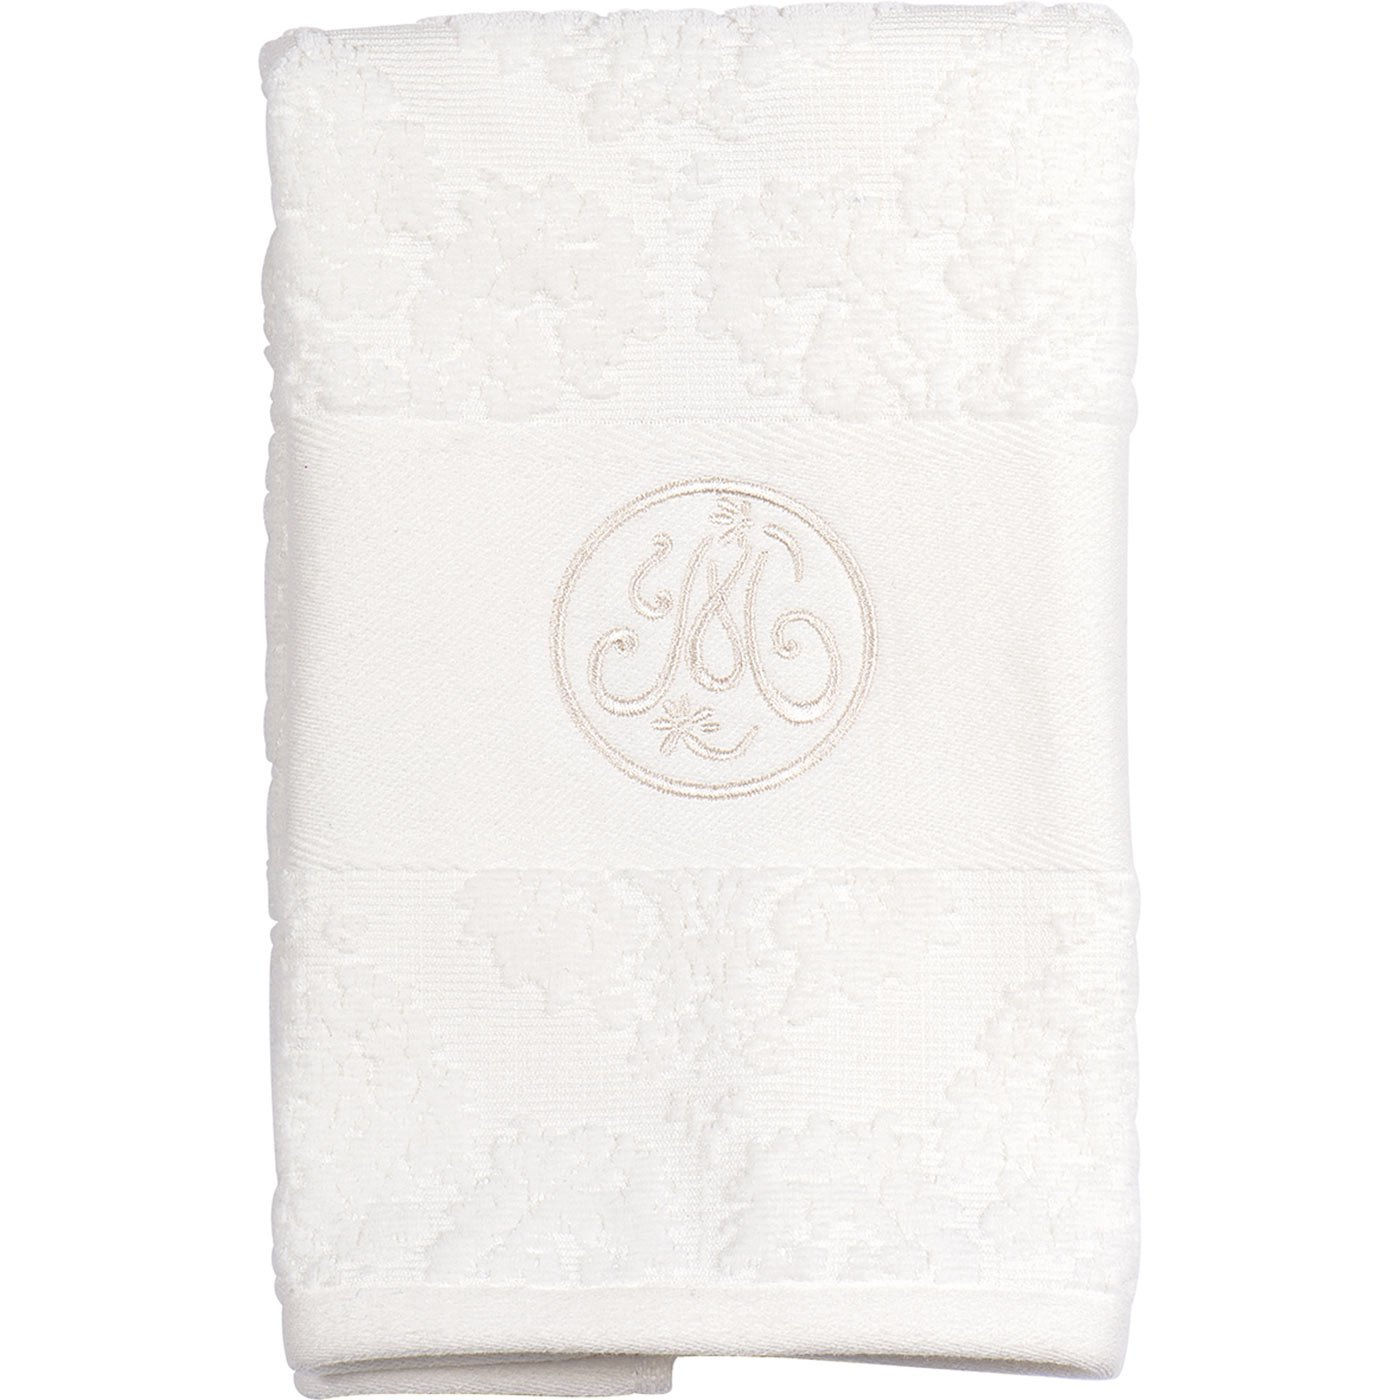 Mathilde M–romántico estilo francés parisino servilletas en algodón, algodón, Broderie, Face Towel 30 x 50 cm